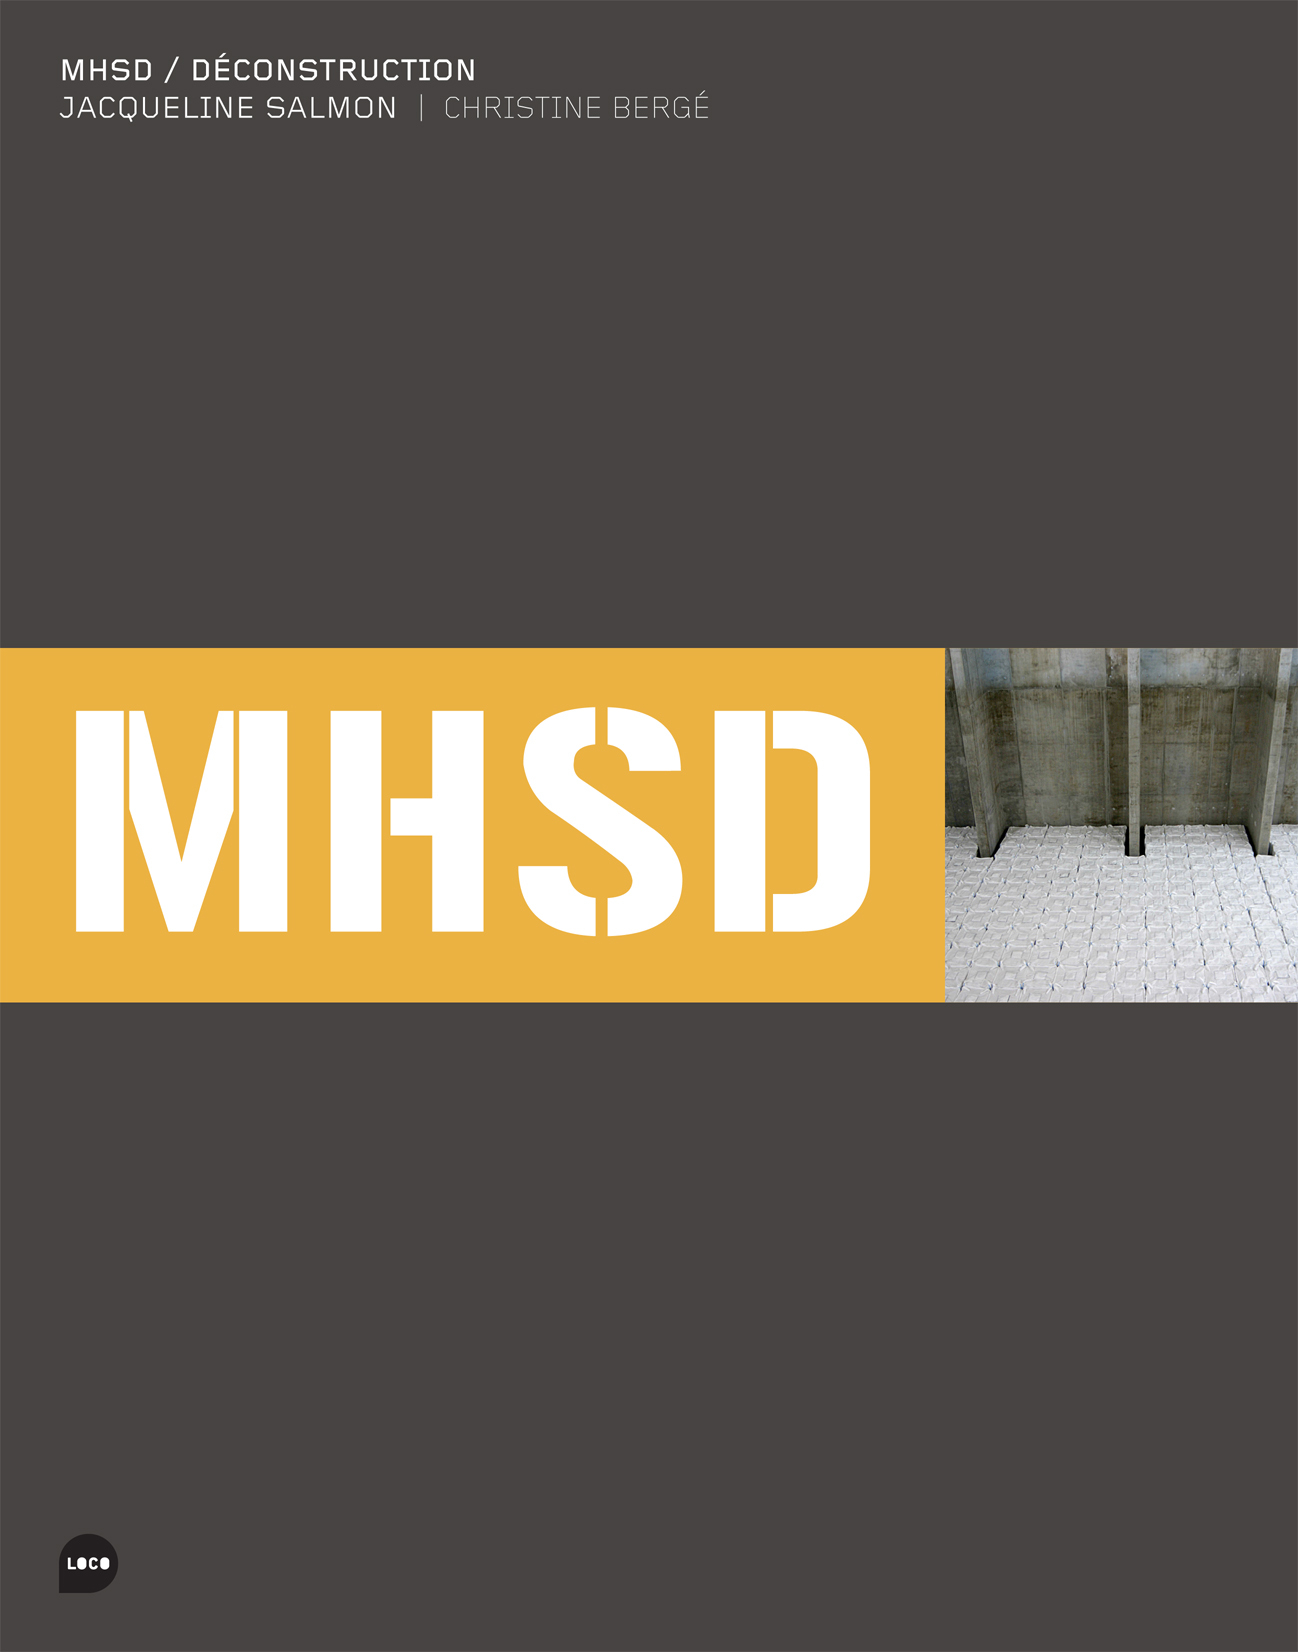 MHSD - DECONSTRUCTION